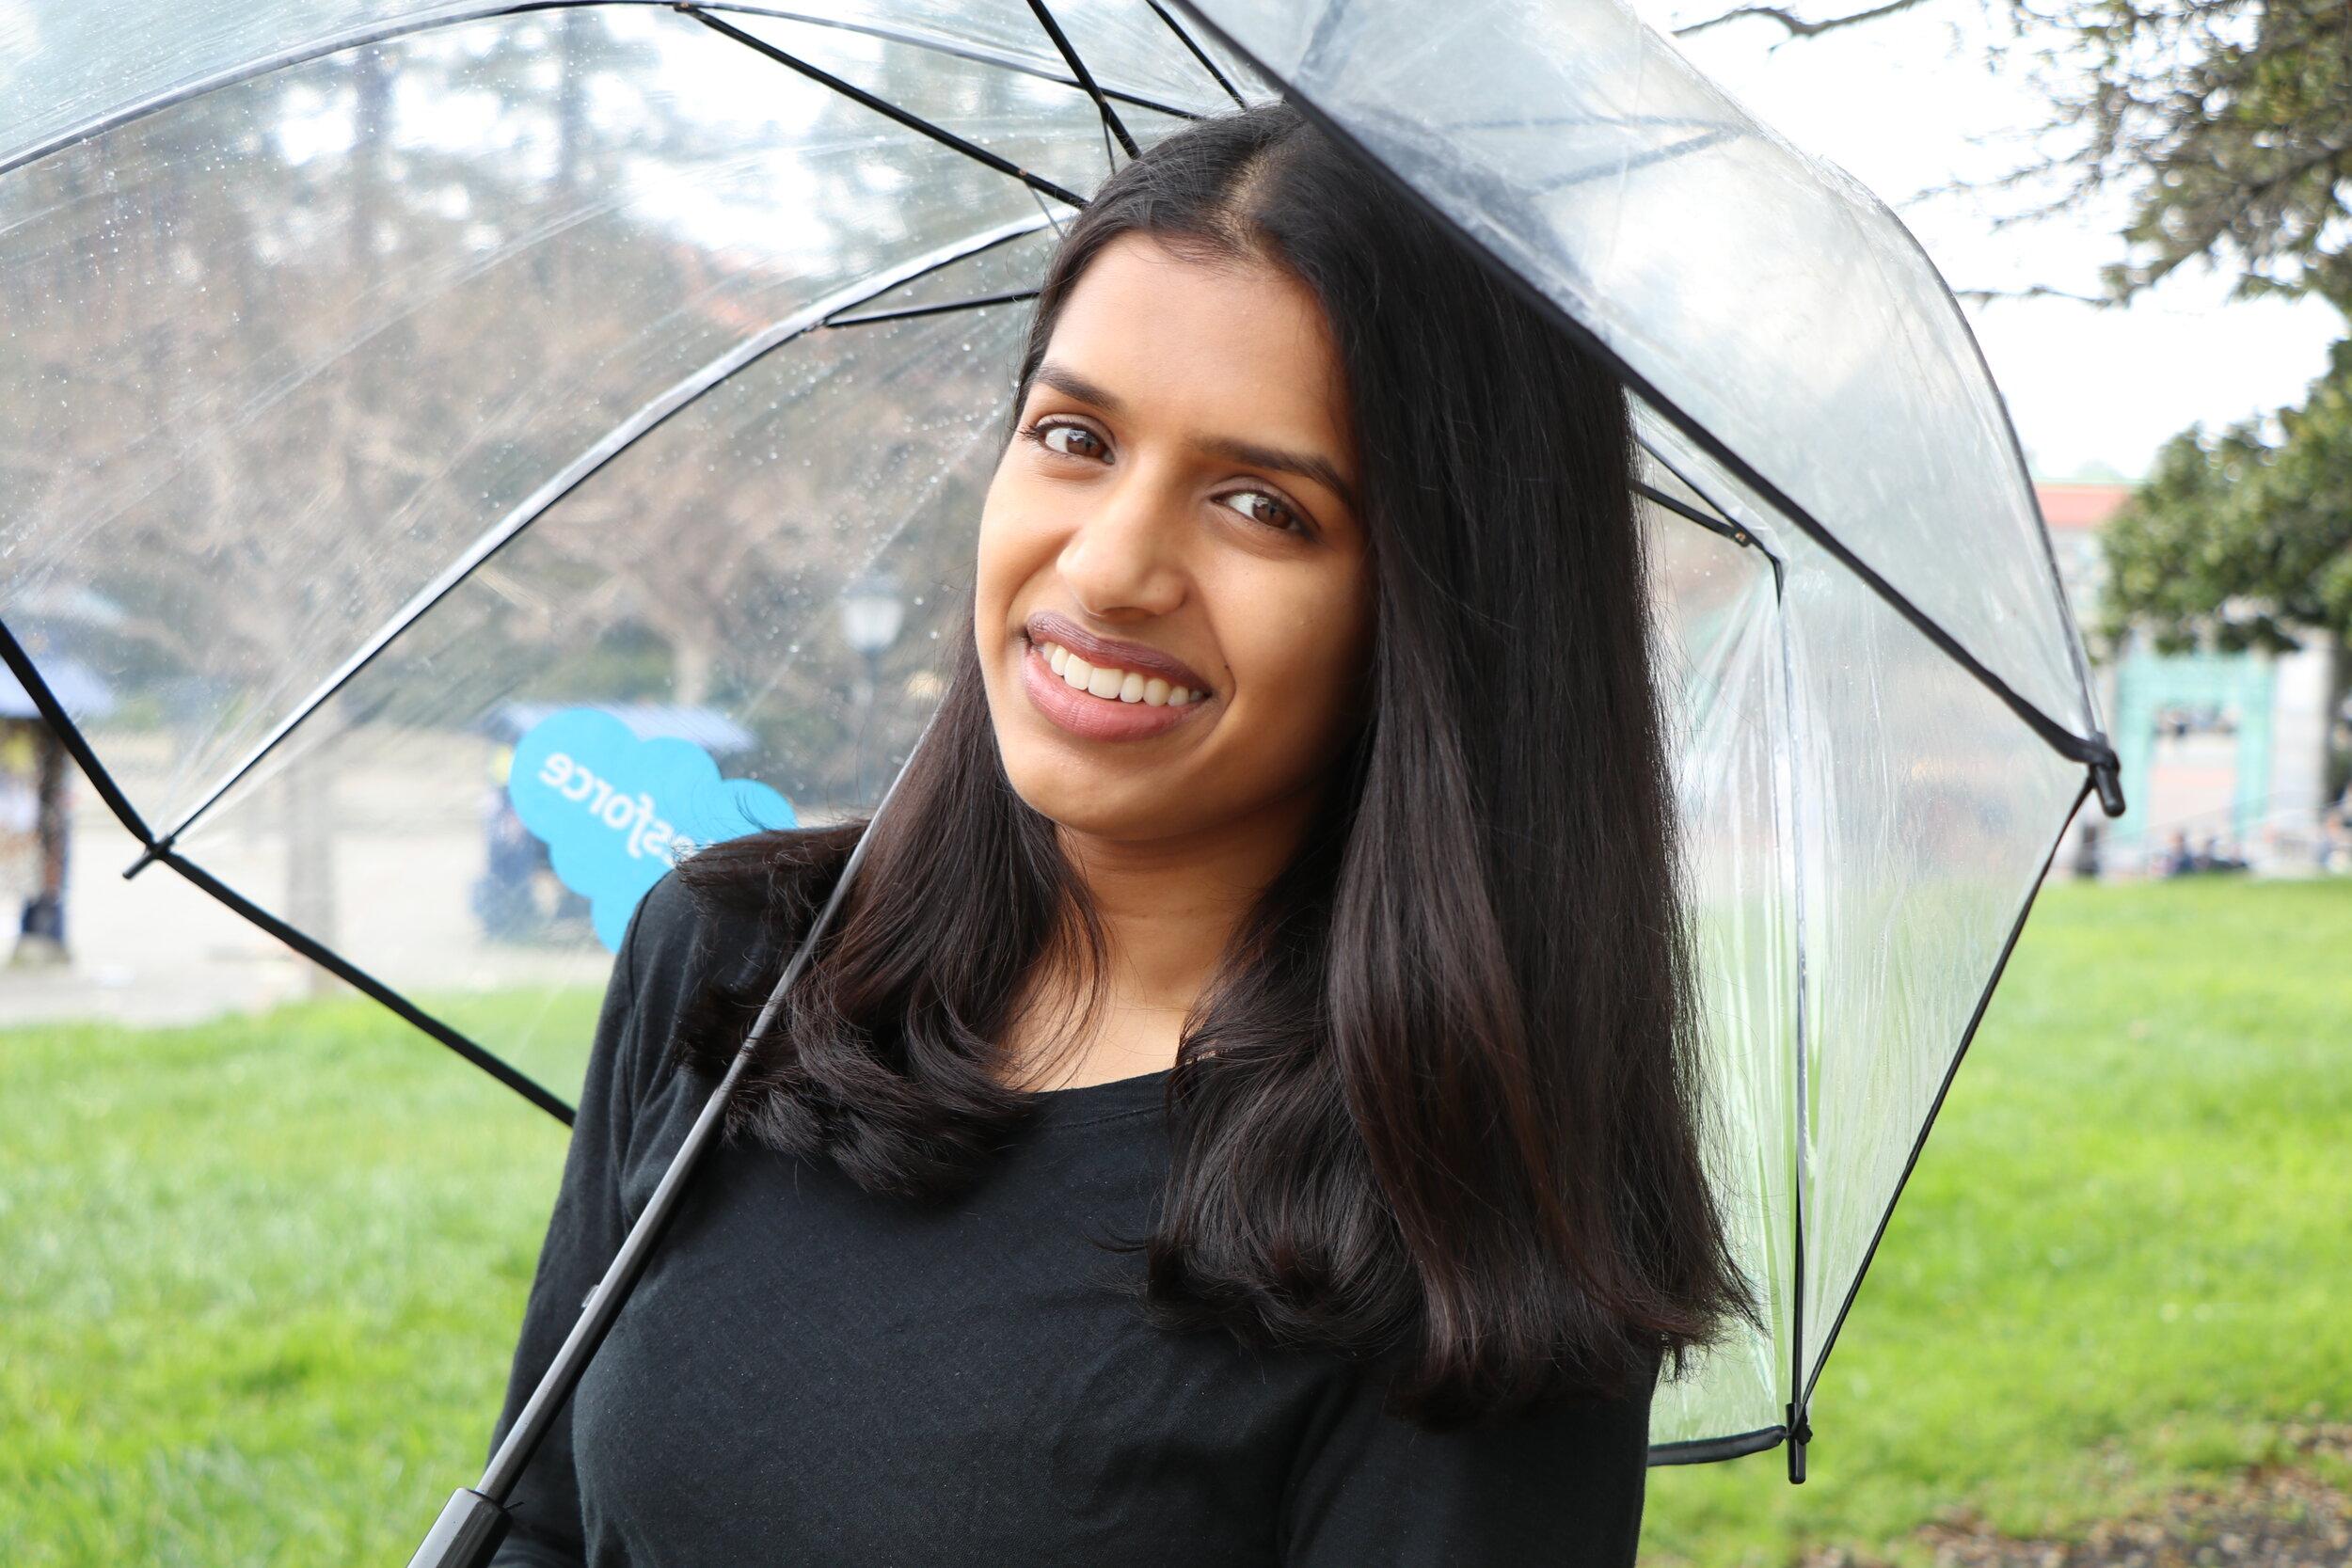 Swetha Prabakaran ● Computer Science, Dance & Performance Studies Double Major ● UC Berkeley